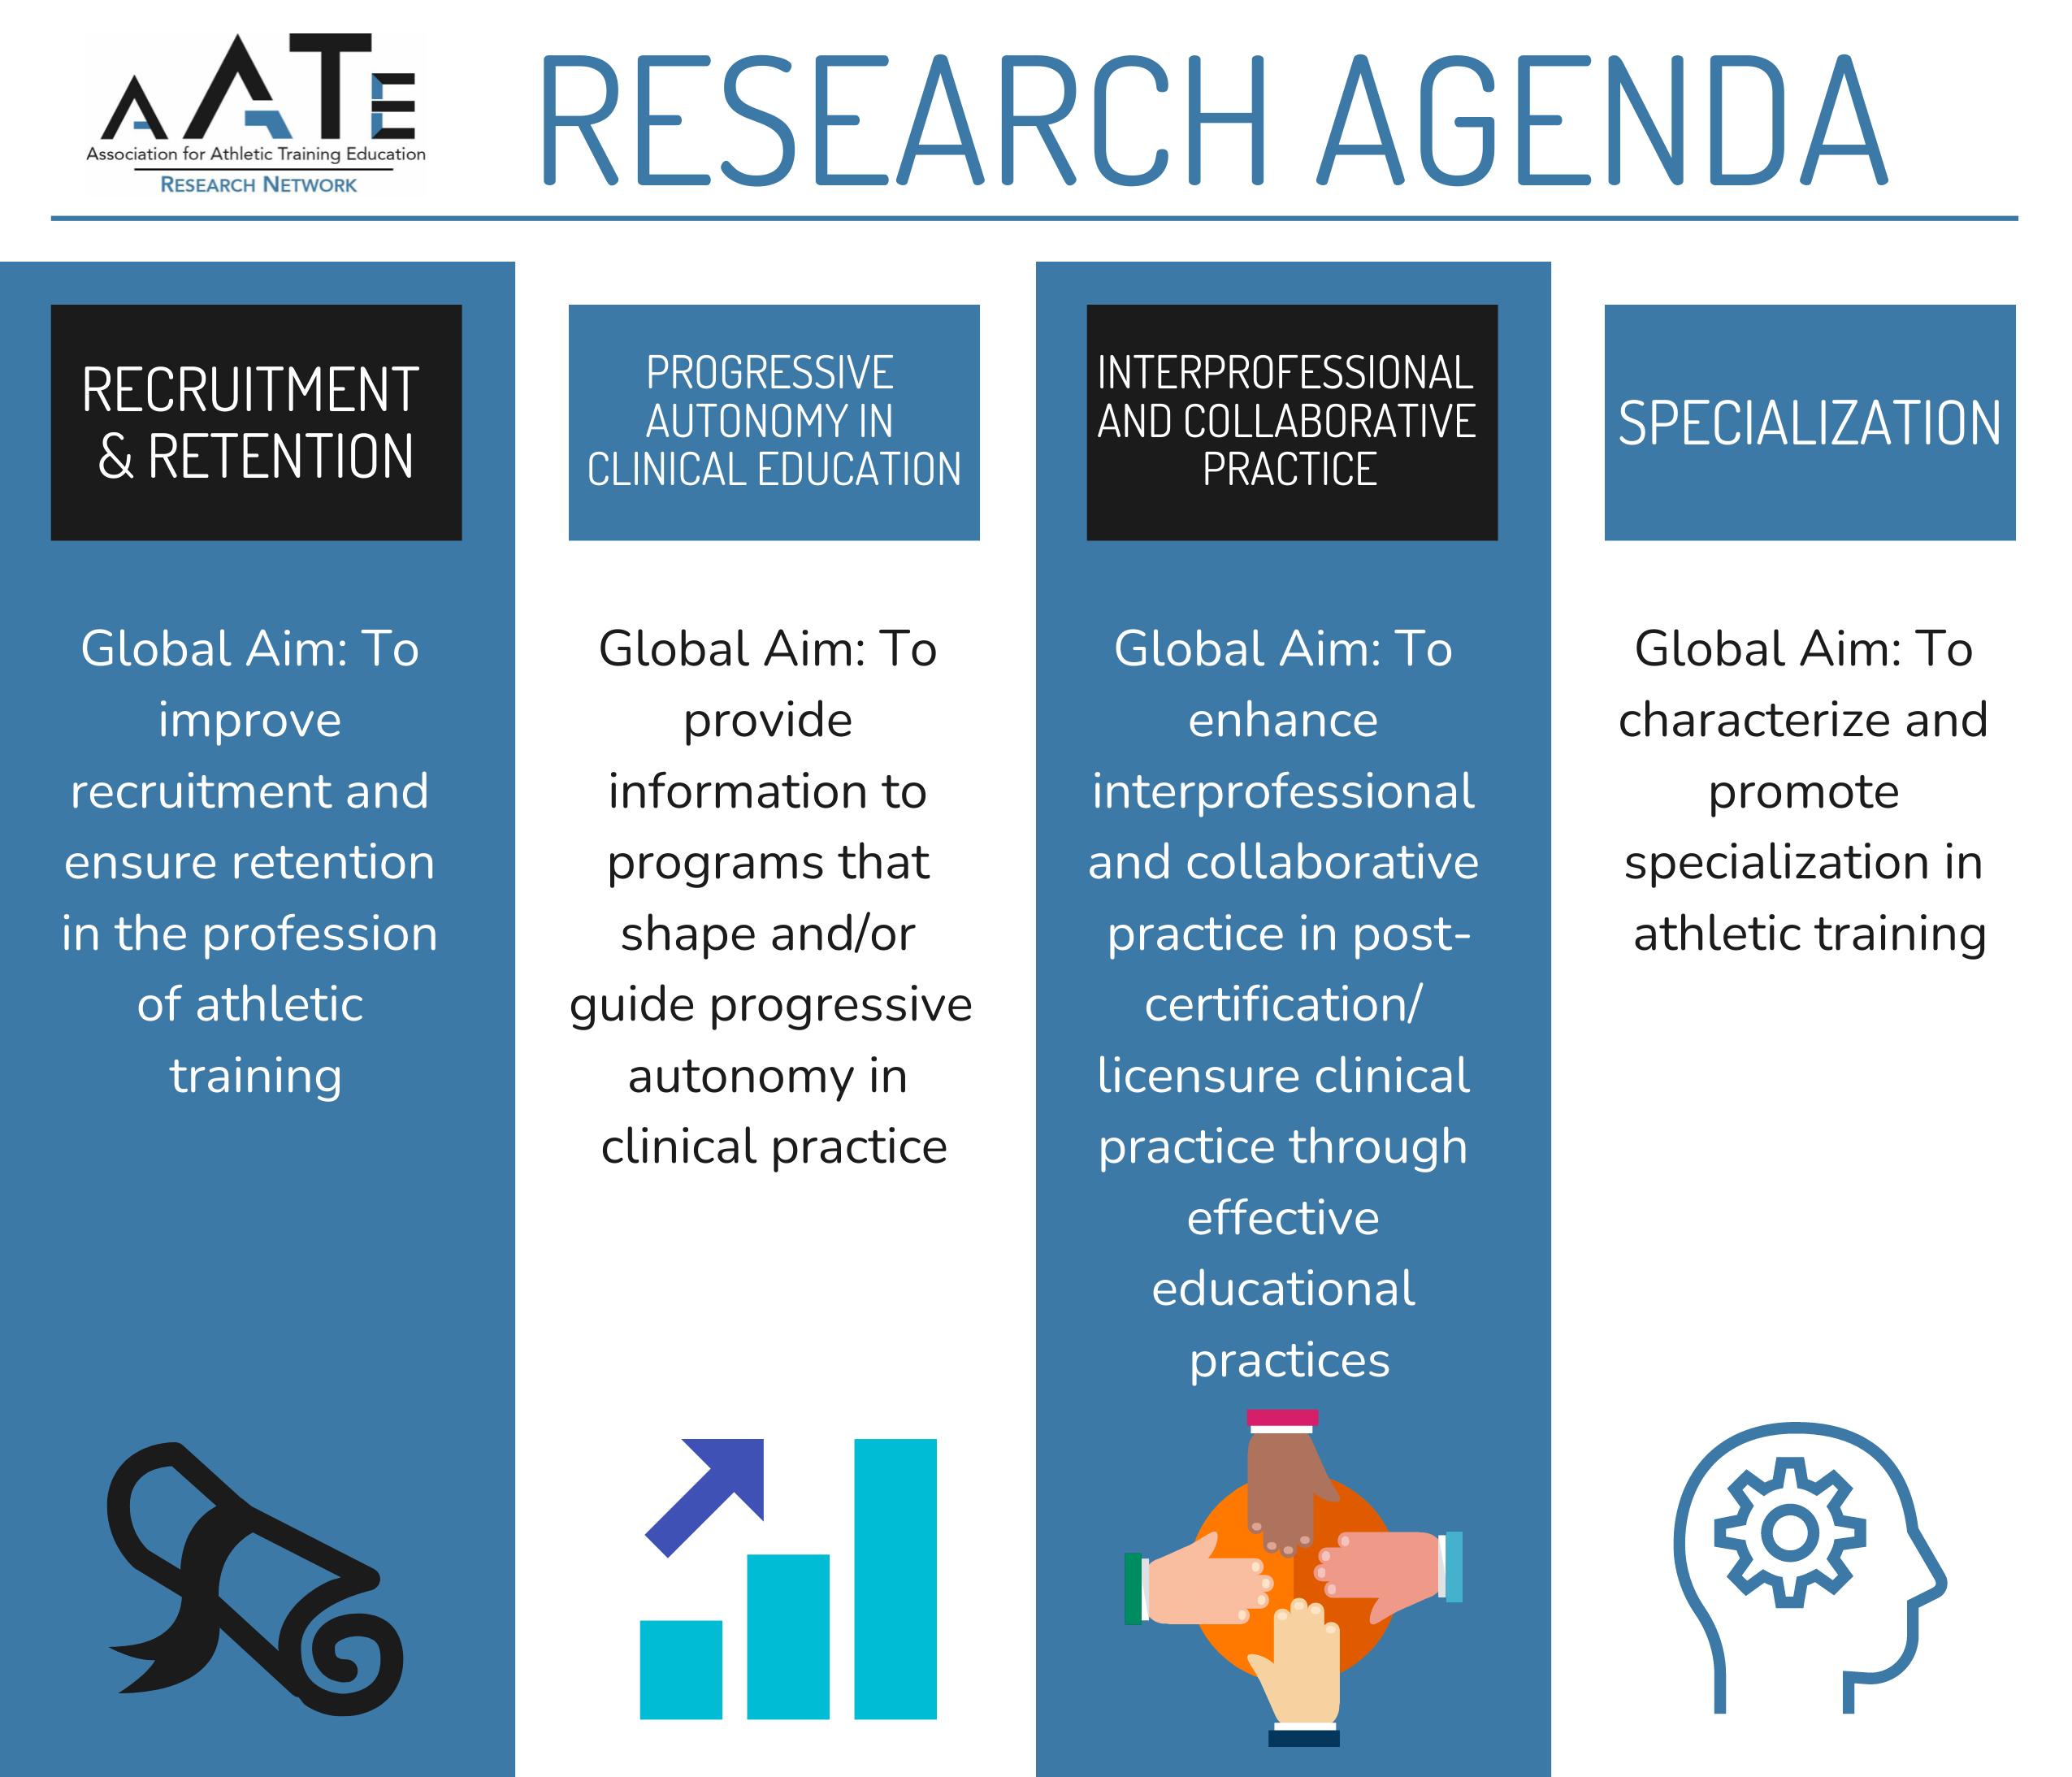 AATE RN Agenda